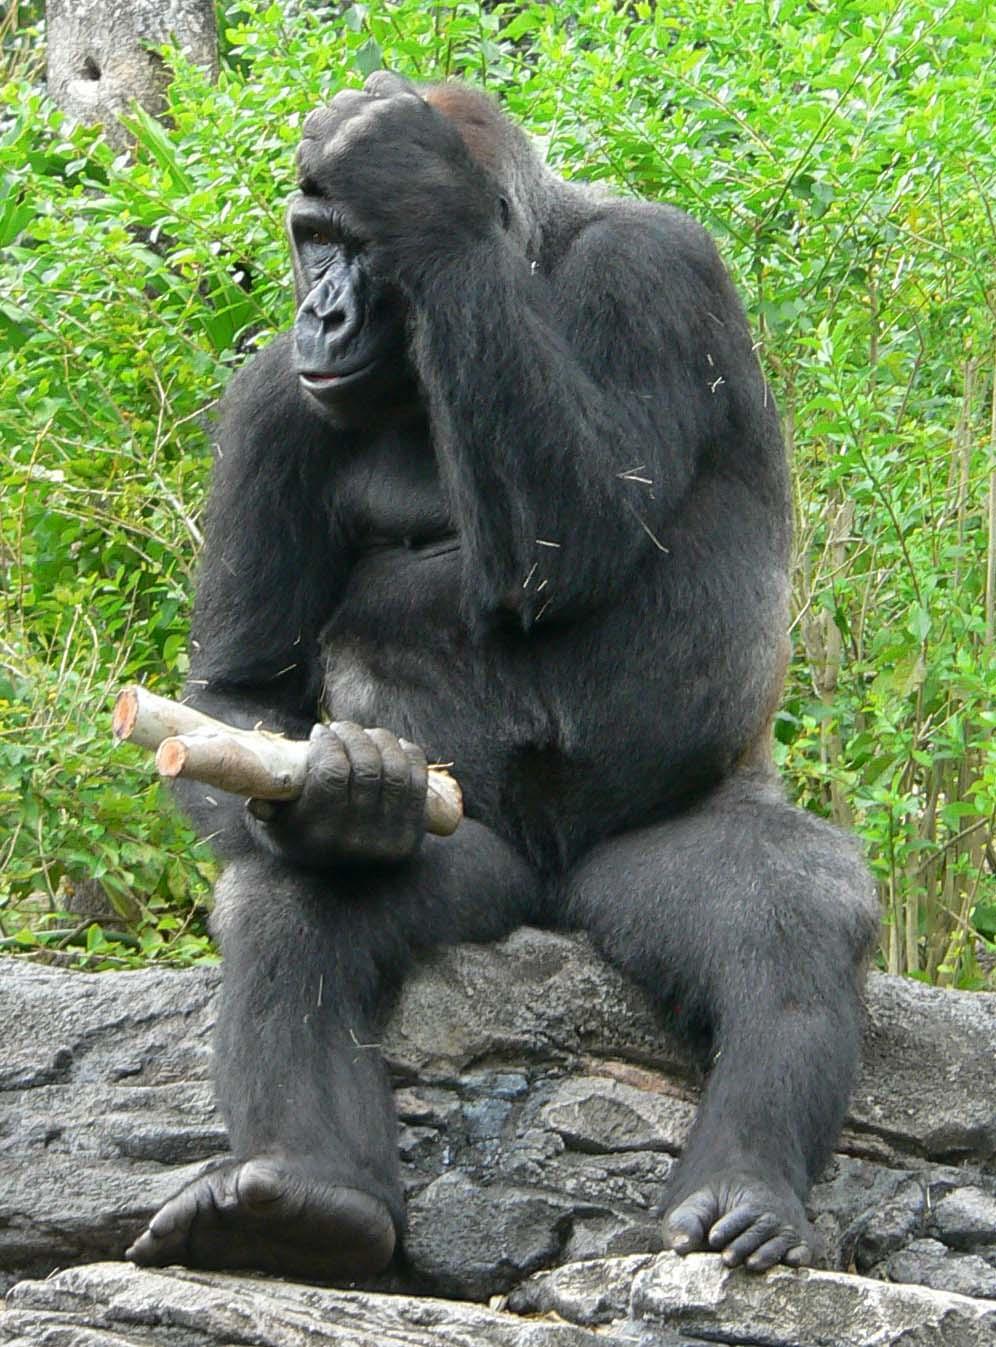 File:Gorilla gorilla gorilla4.jpg - Wikimedia Commons